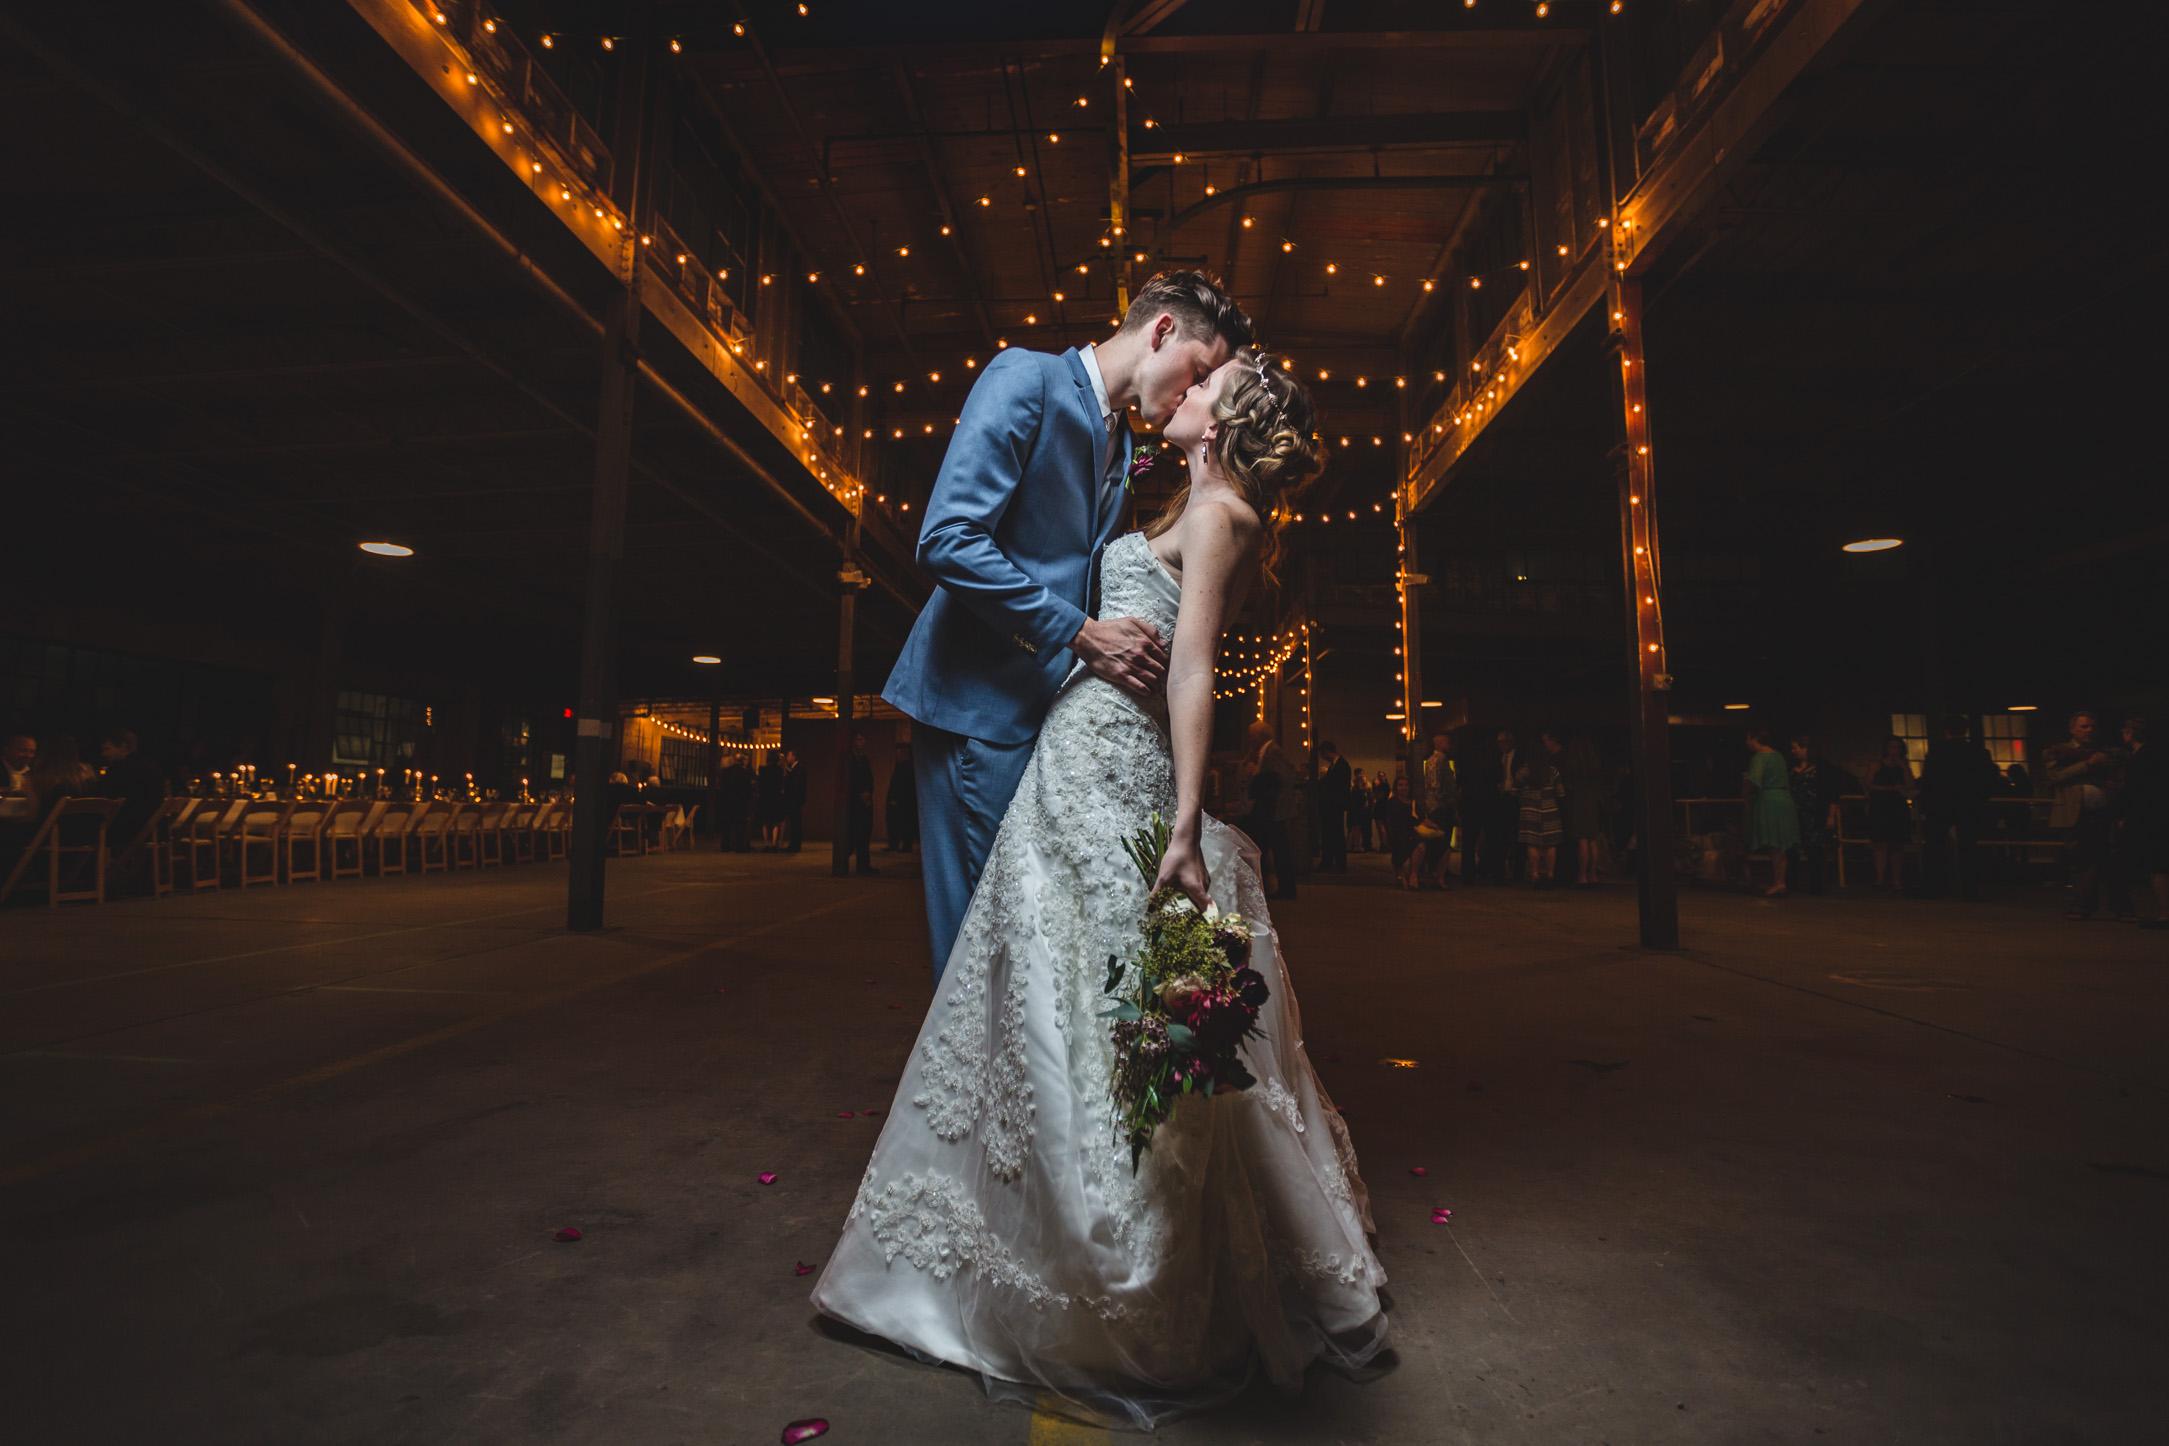 Adam-Szrmack-The-Glass-Factory-Wedding-125.jpg